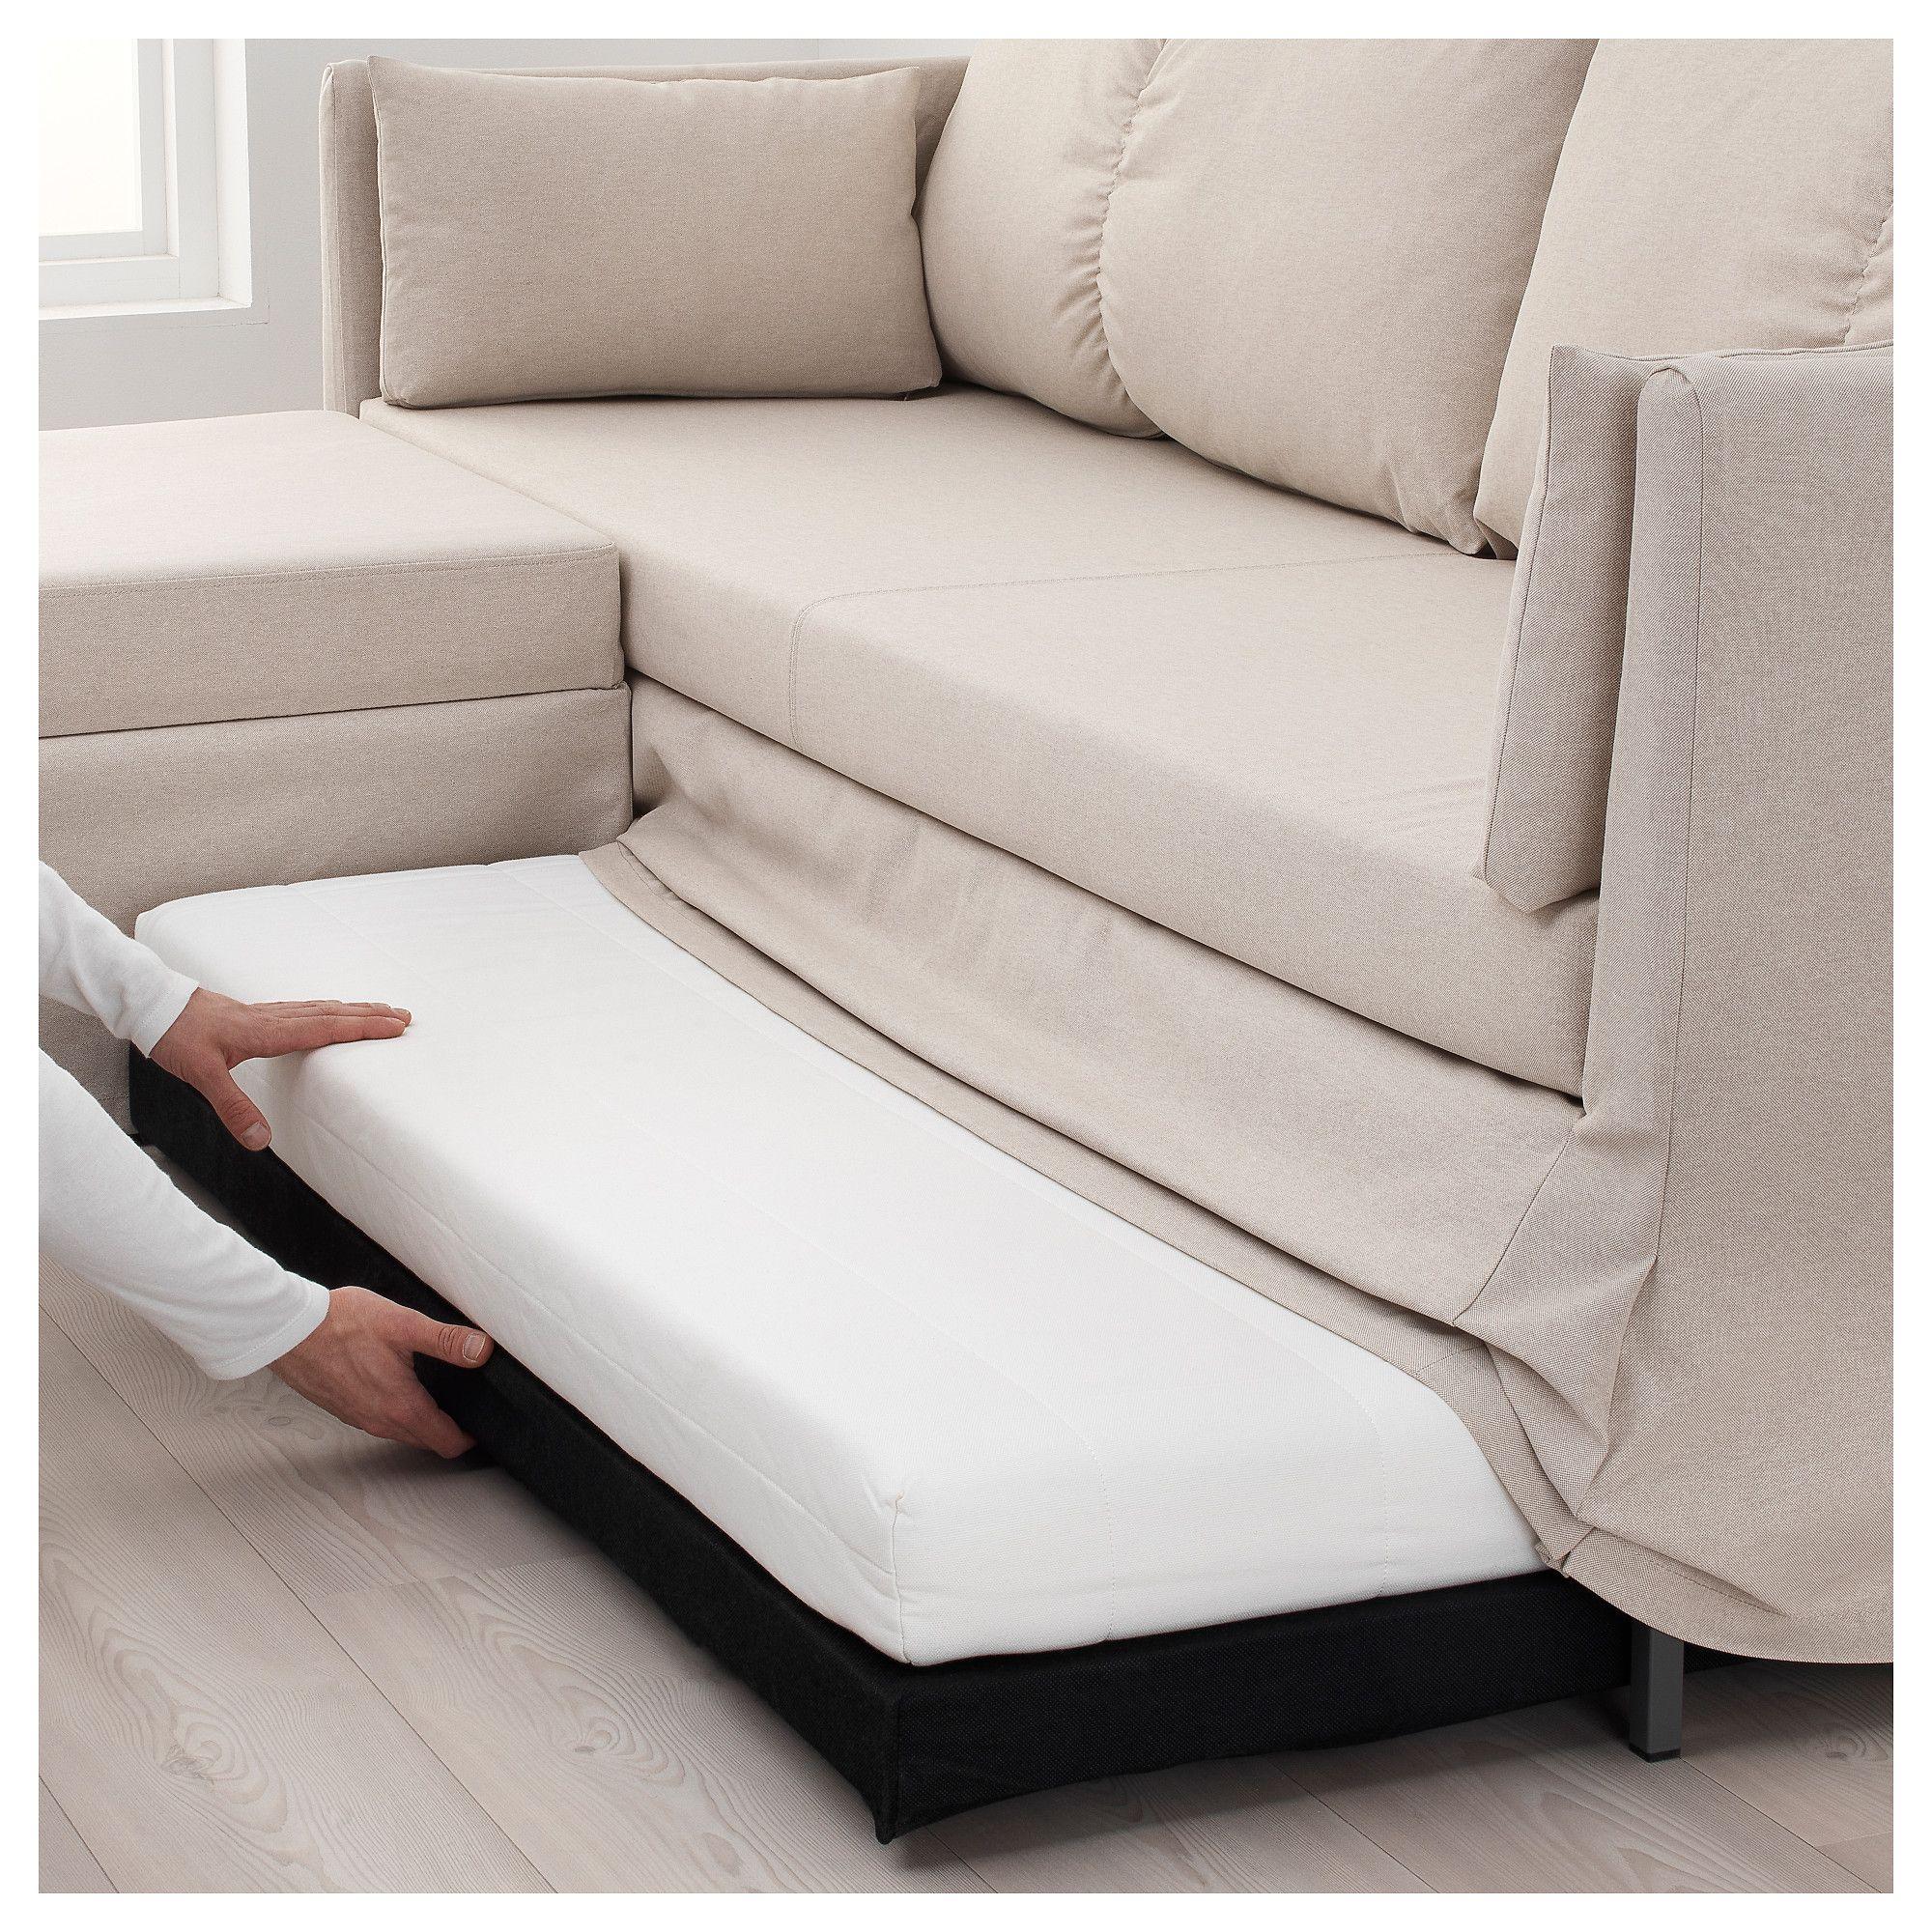 Ikea Sandbacken Corner Sofa Bed Lofallet Beige